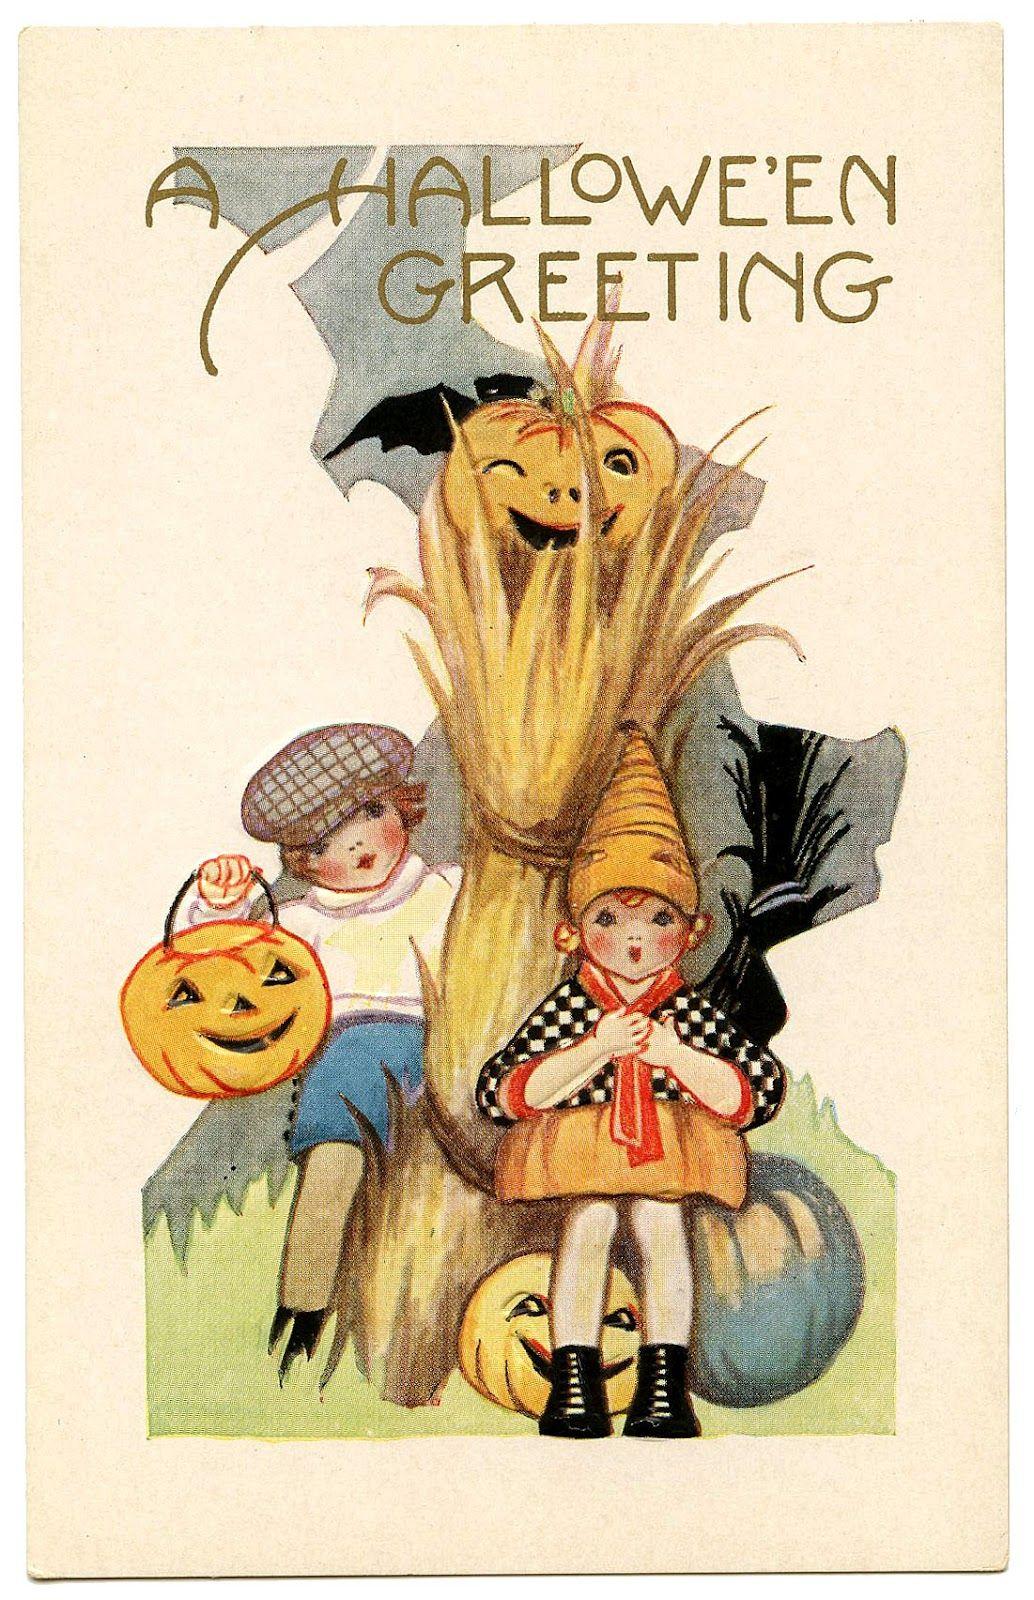 Vintage Halloween Graphic